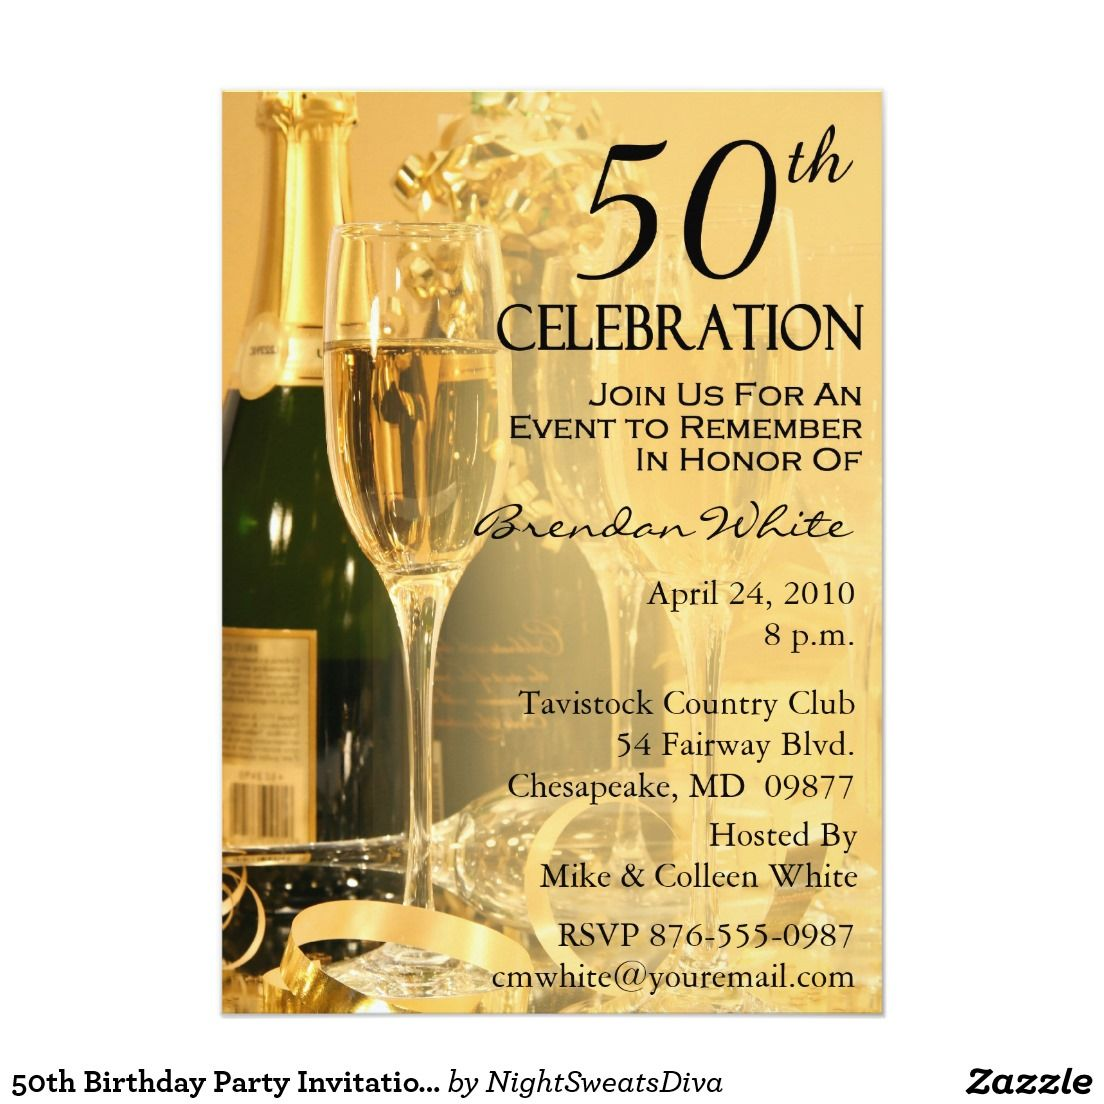 50th Birthday Party Invitations Birthday Party Invitations